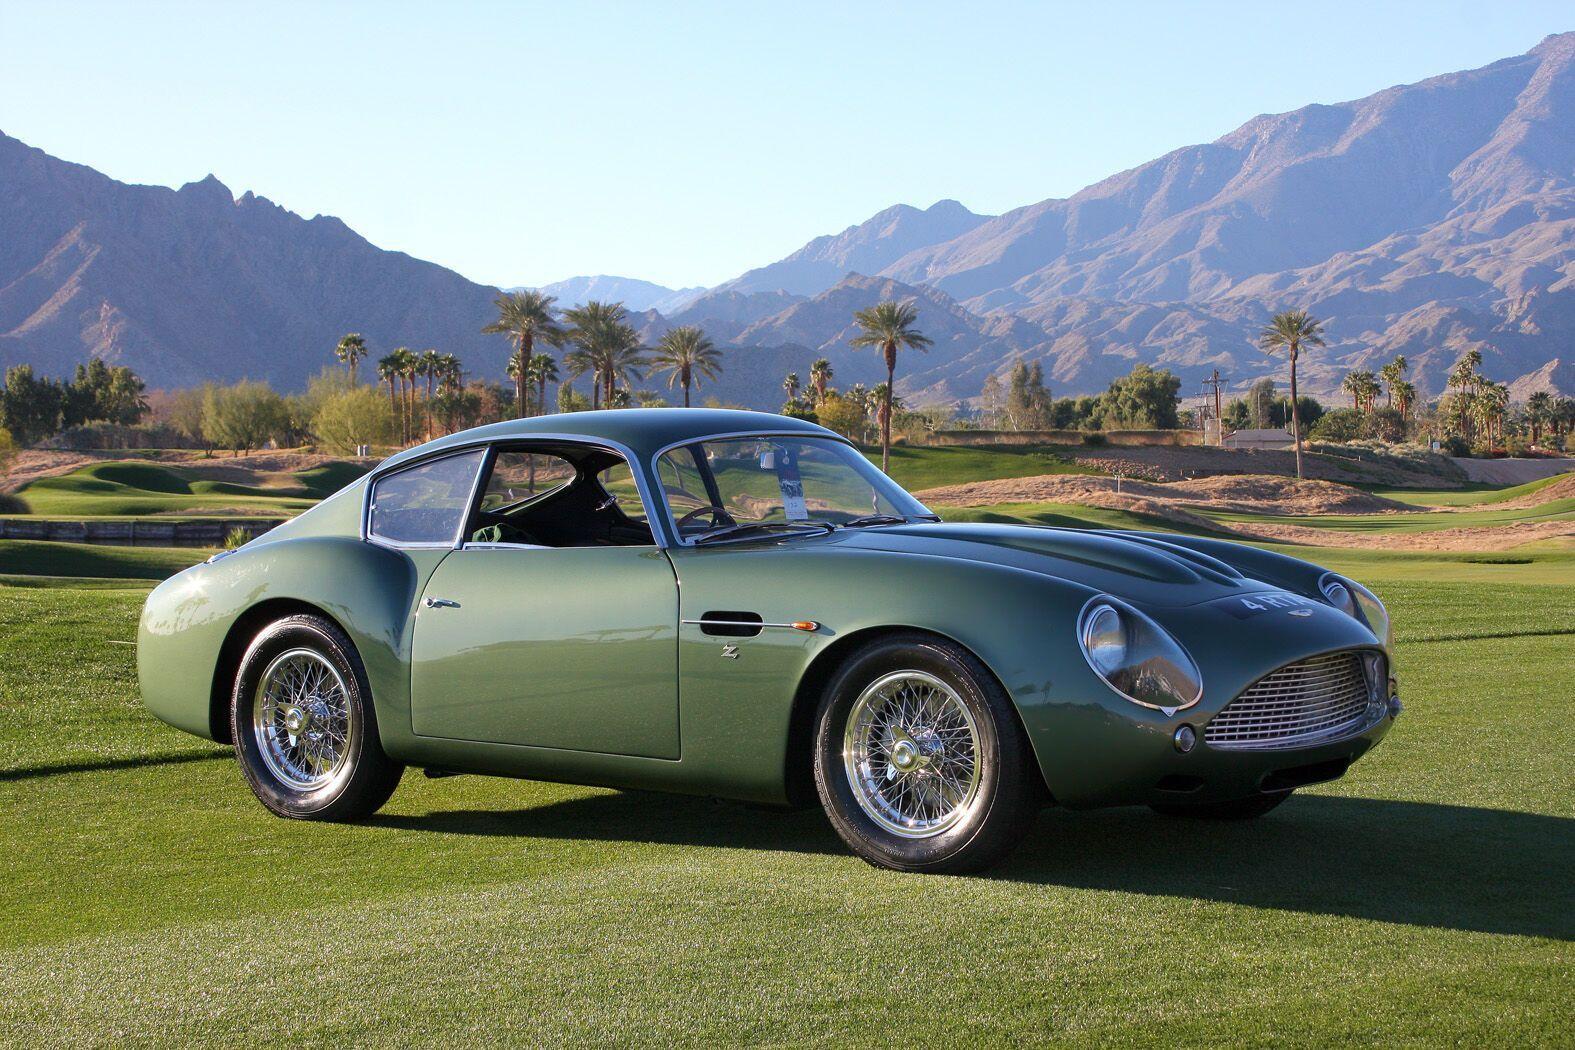 Aston Martin DB4 GT стал самым быстрым авто 50-х